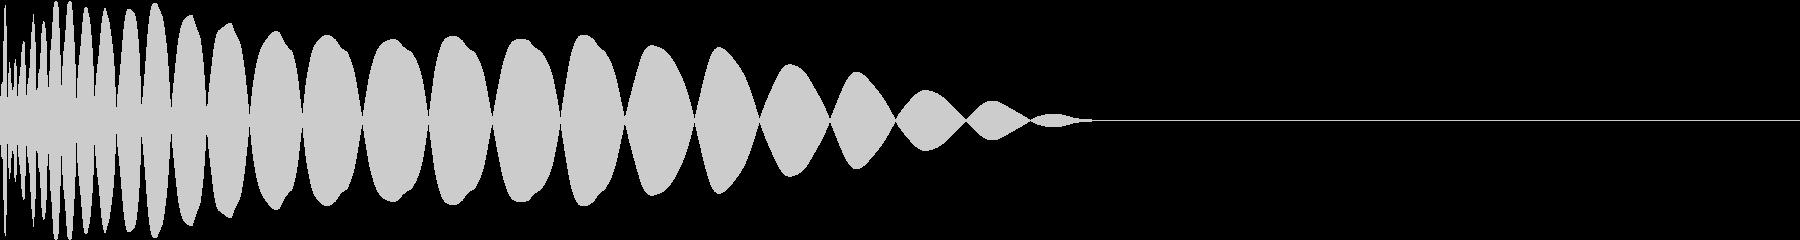 DTM Kick 54 オリジナル音源の未再生の波形